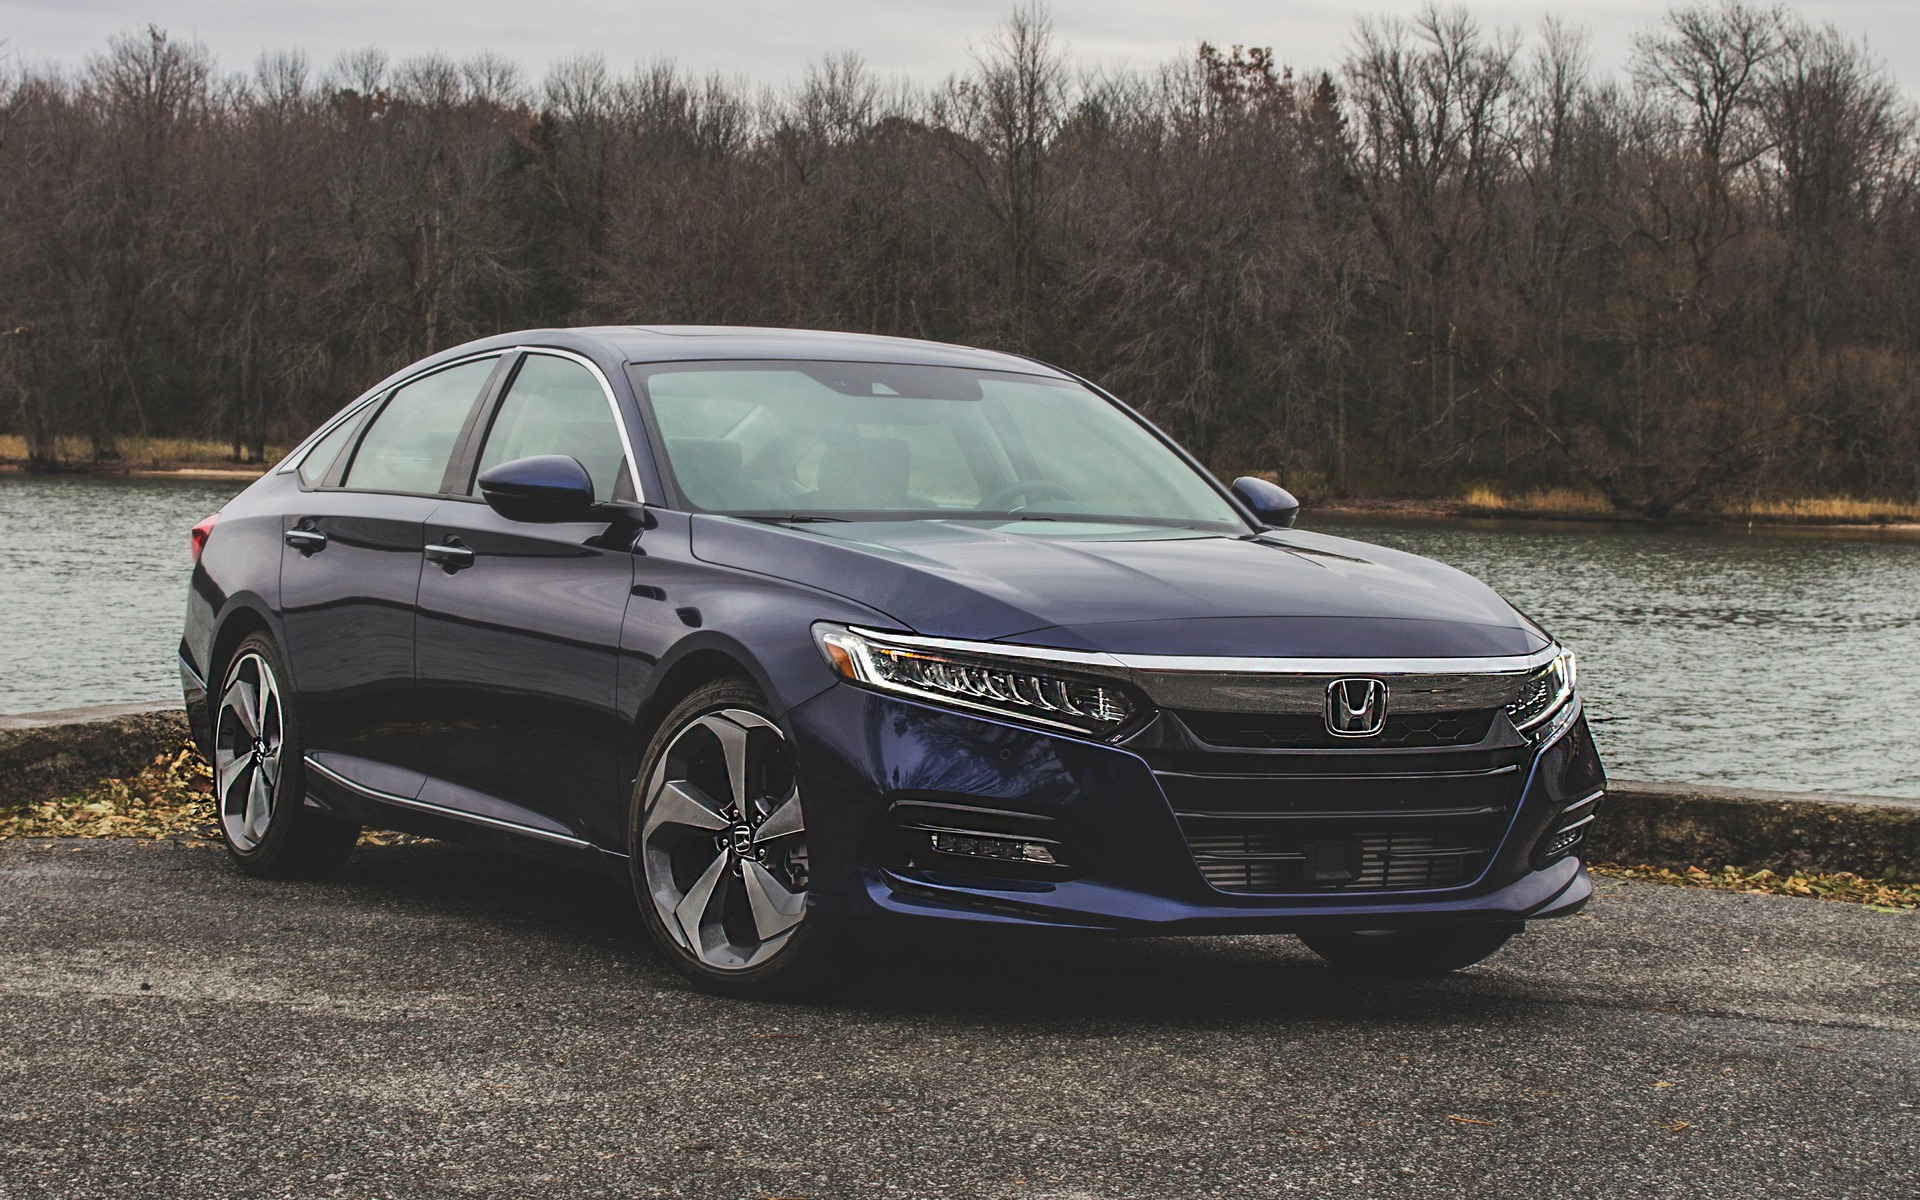 Best new car - The Car Guide / Motoring TV